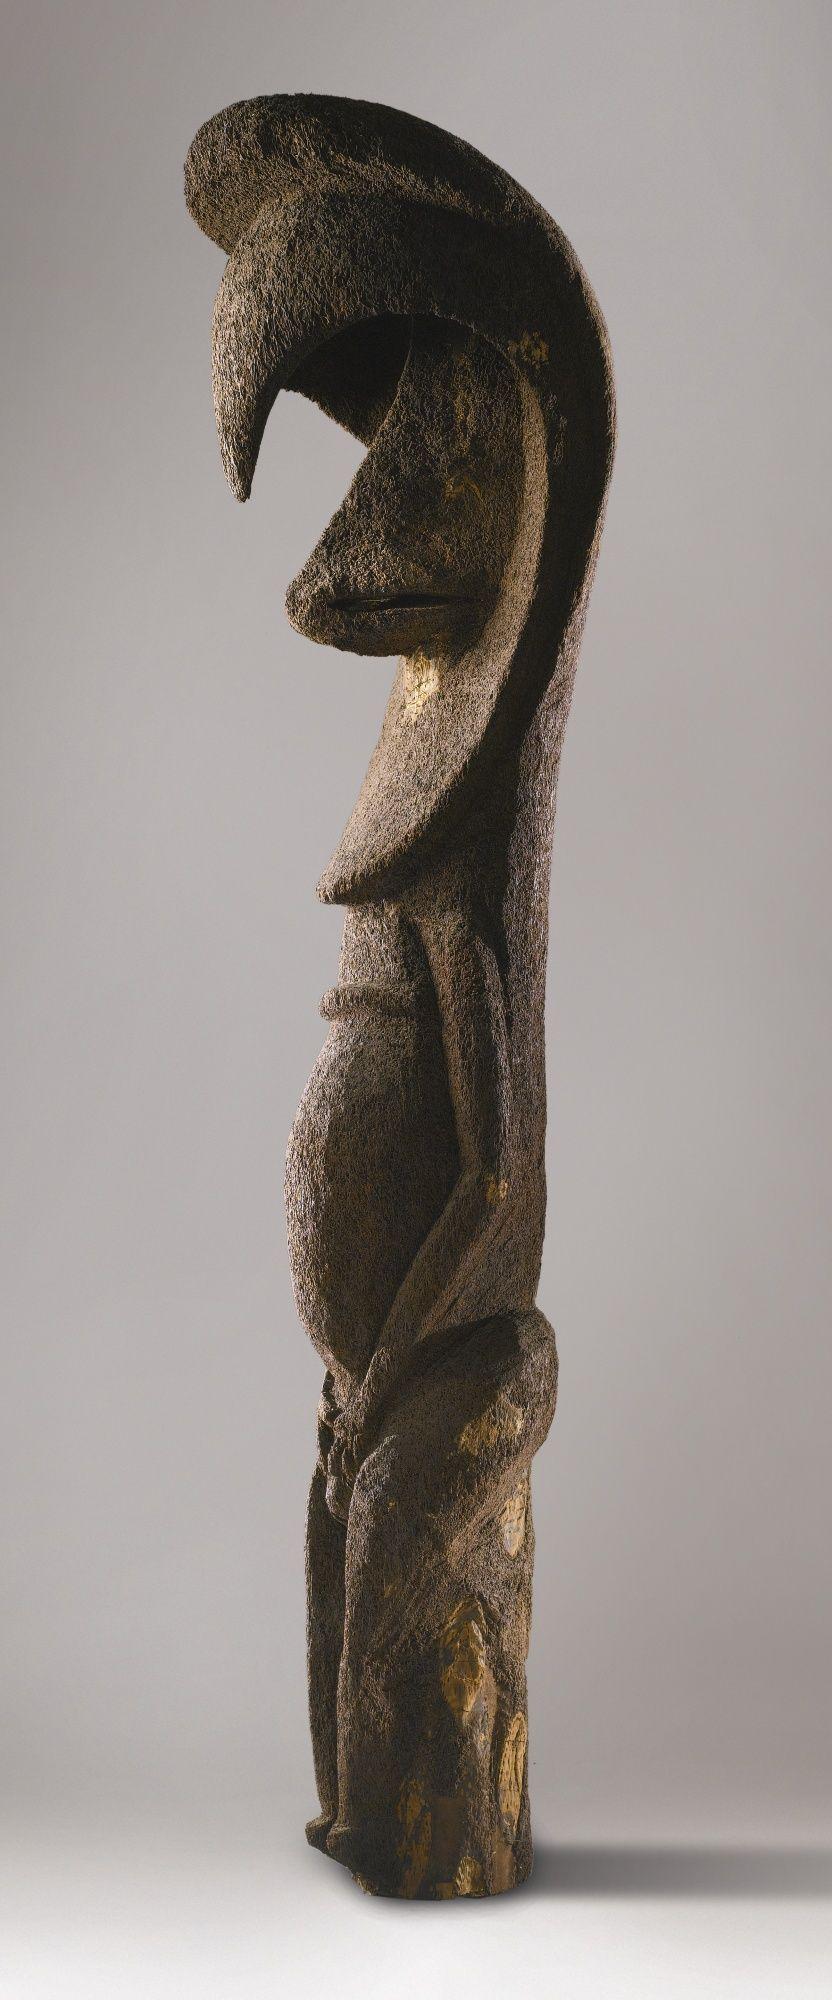 Fernwood Spirit Statue, Ambrym Island, Malampa Province, Vanuatu